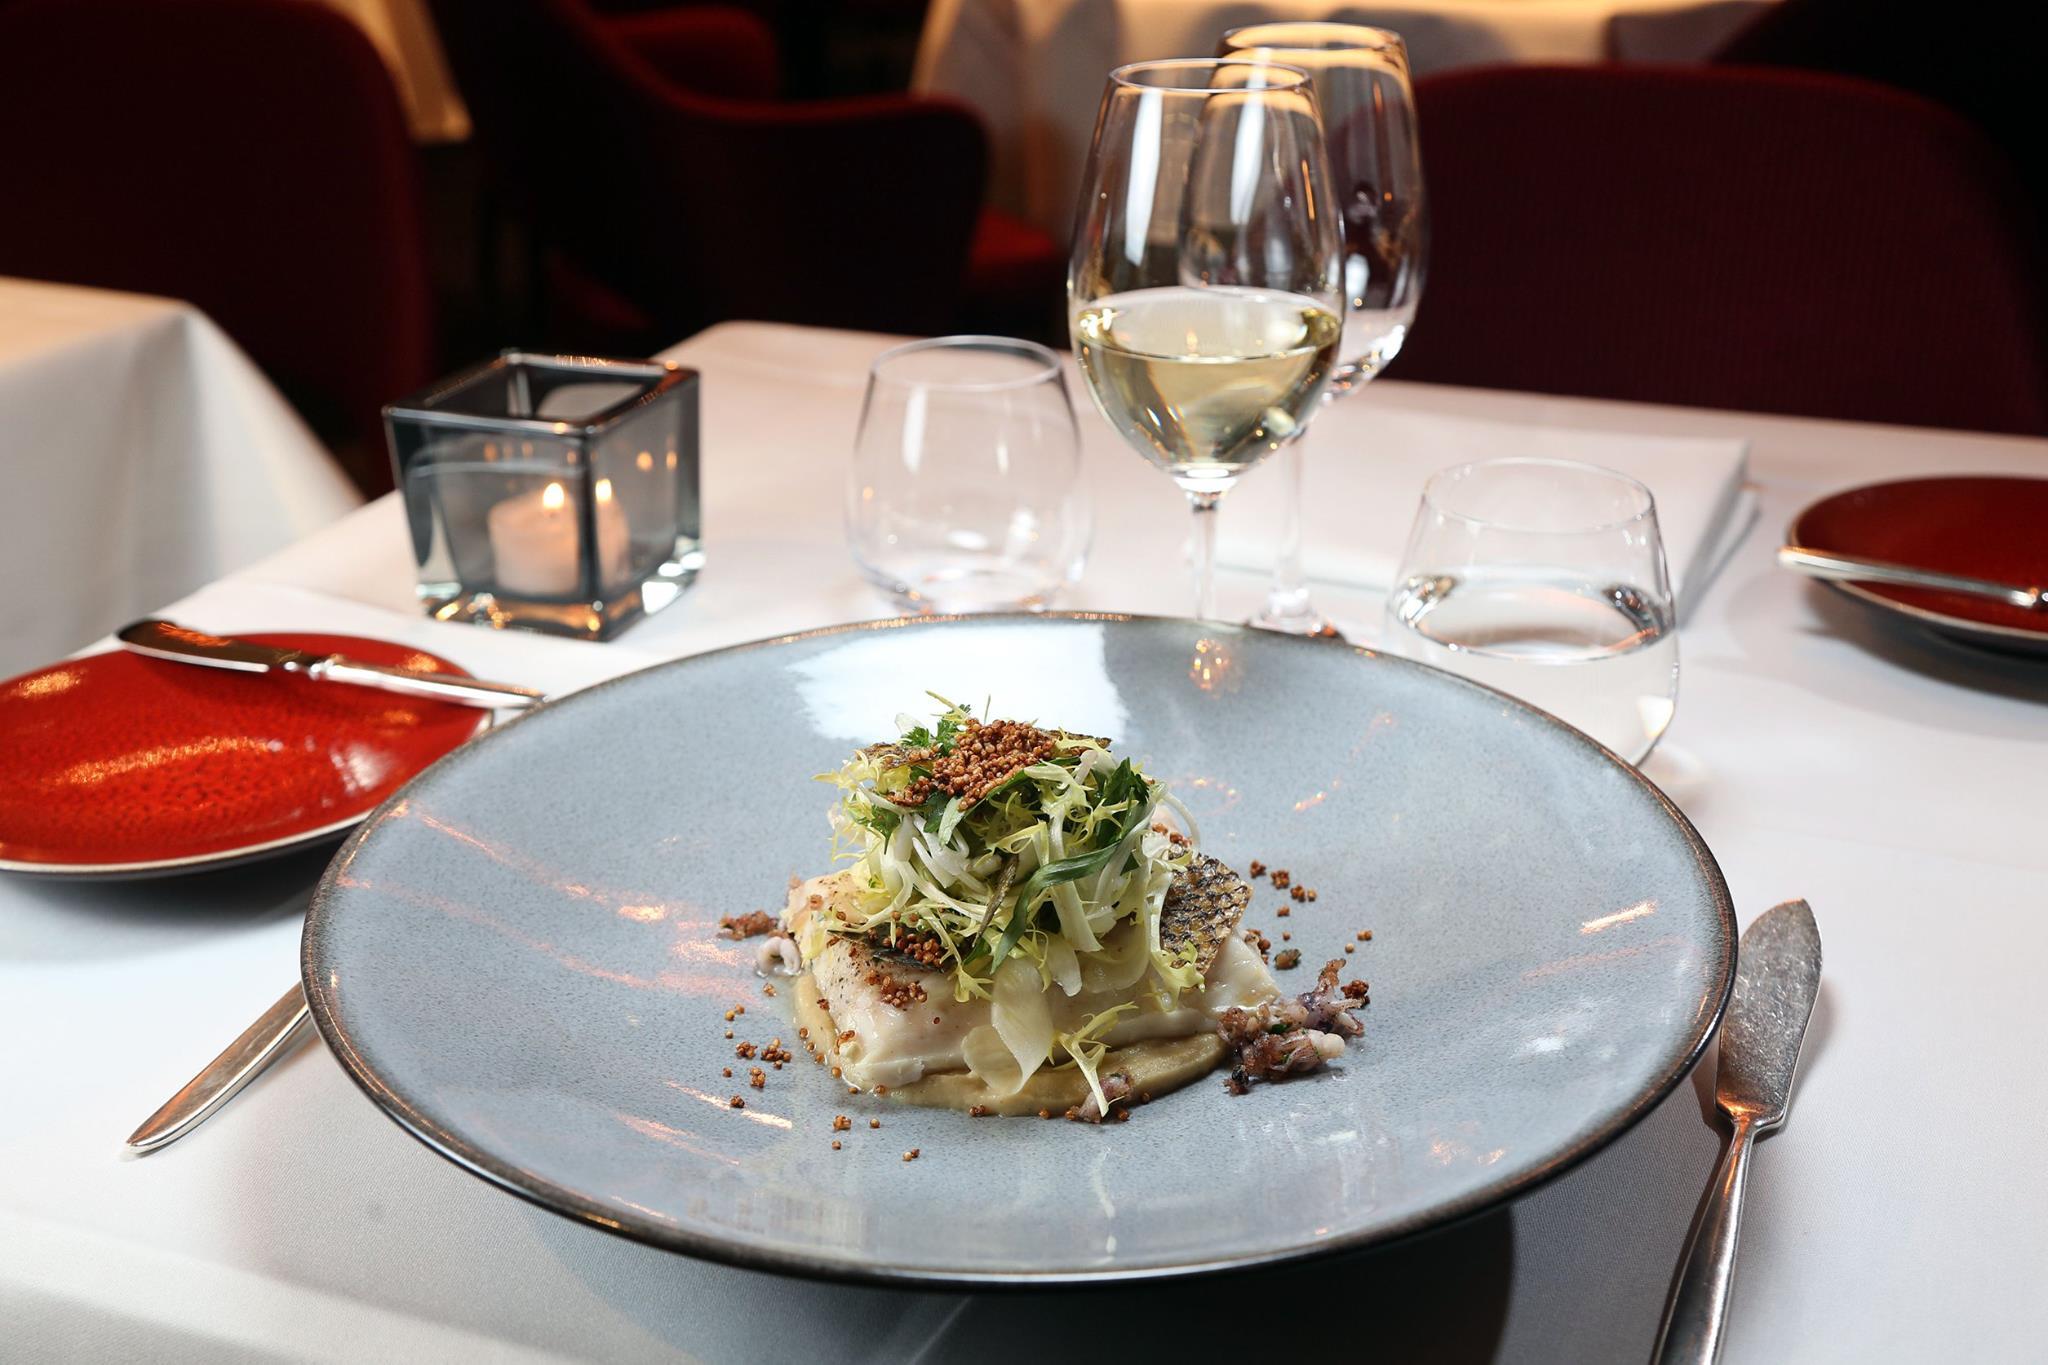 The berlin restaurant guide for fancy dining for Restaurant guide